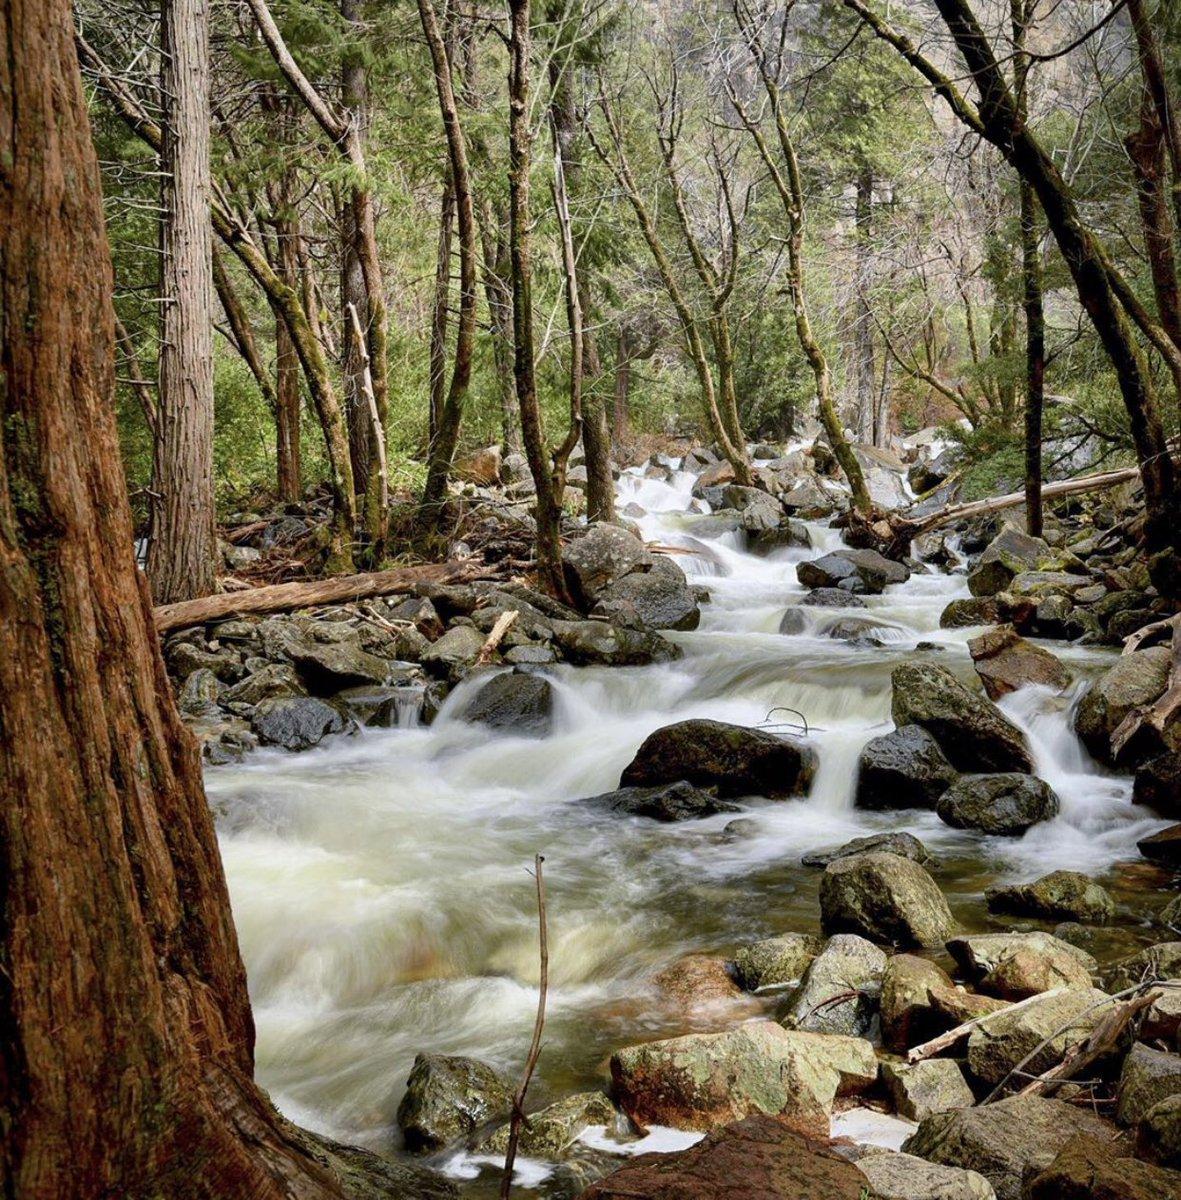 Bridalveil Creek Todays California Photo! - by Remesh Hedge https://t.co/Zjsm9HYToI